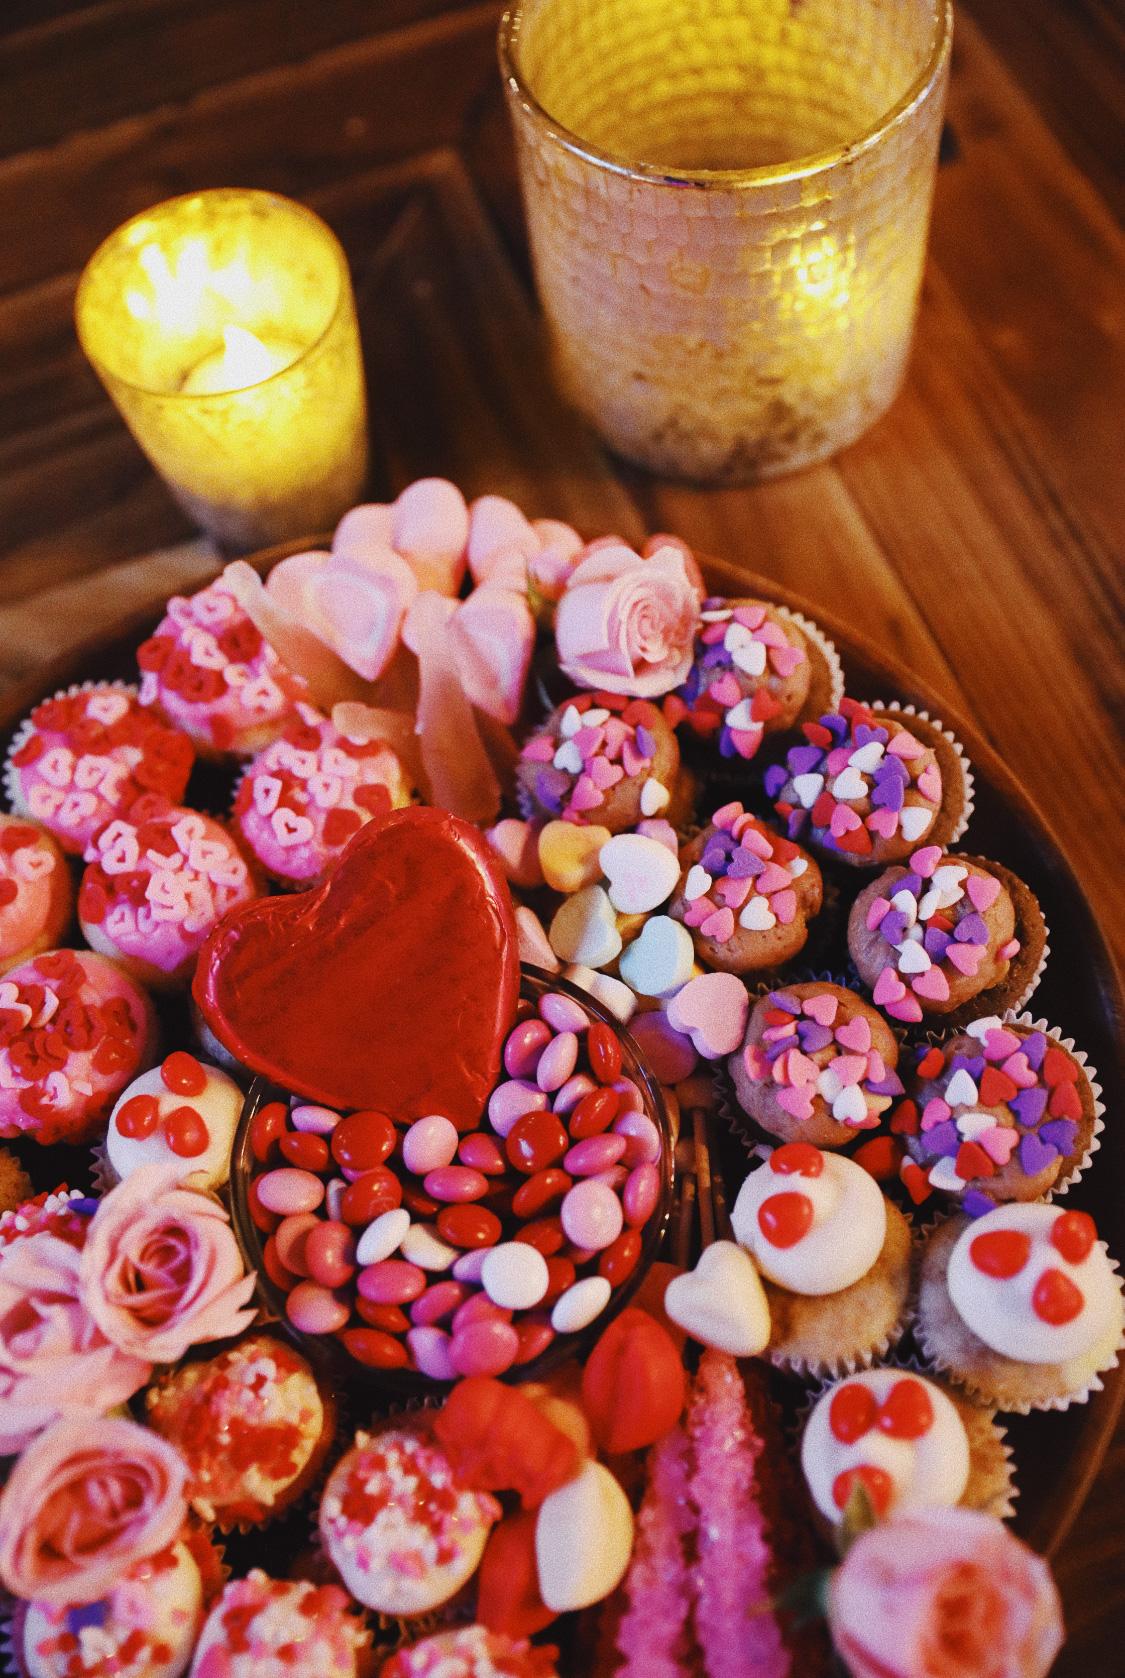 Celebrate with Sarah Valentine's Day dessert platter